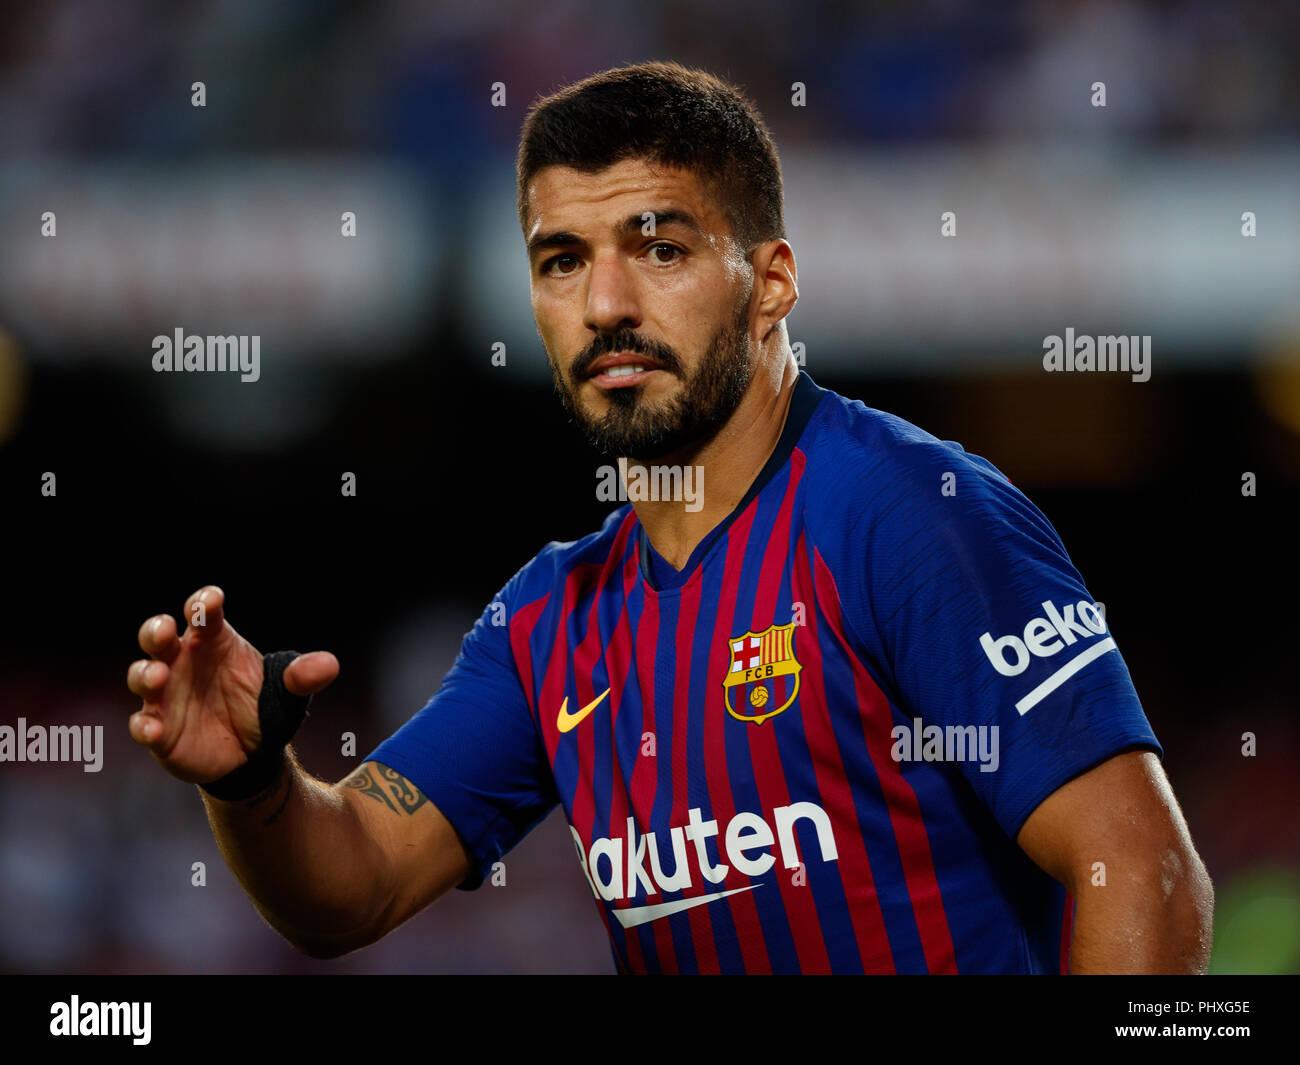 Barcelona Spain 02nd Sep 2018 Luis Suarez Player Of Fc